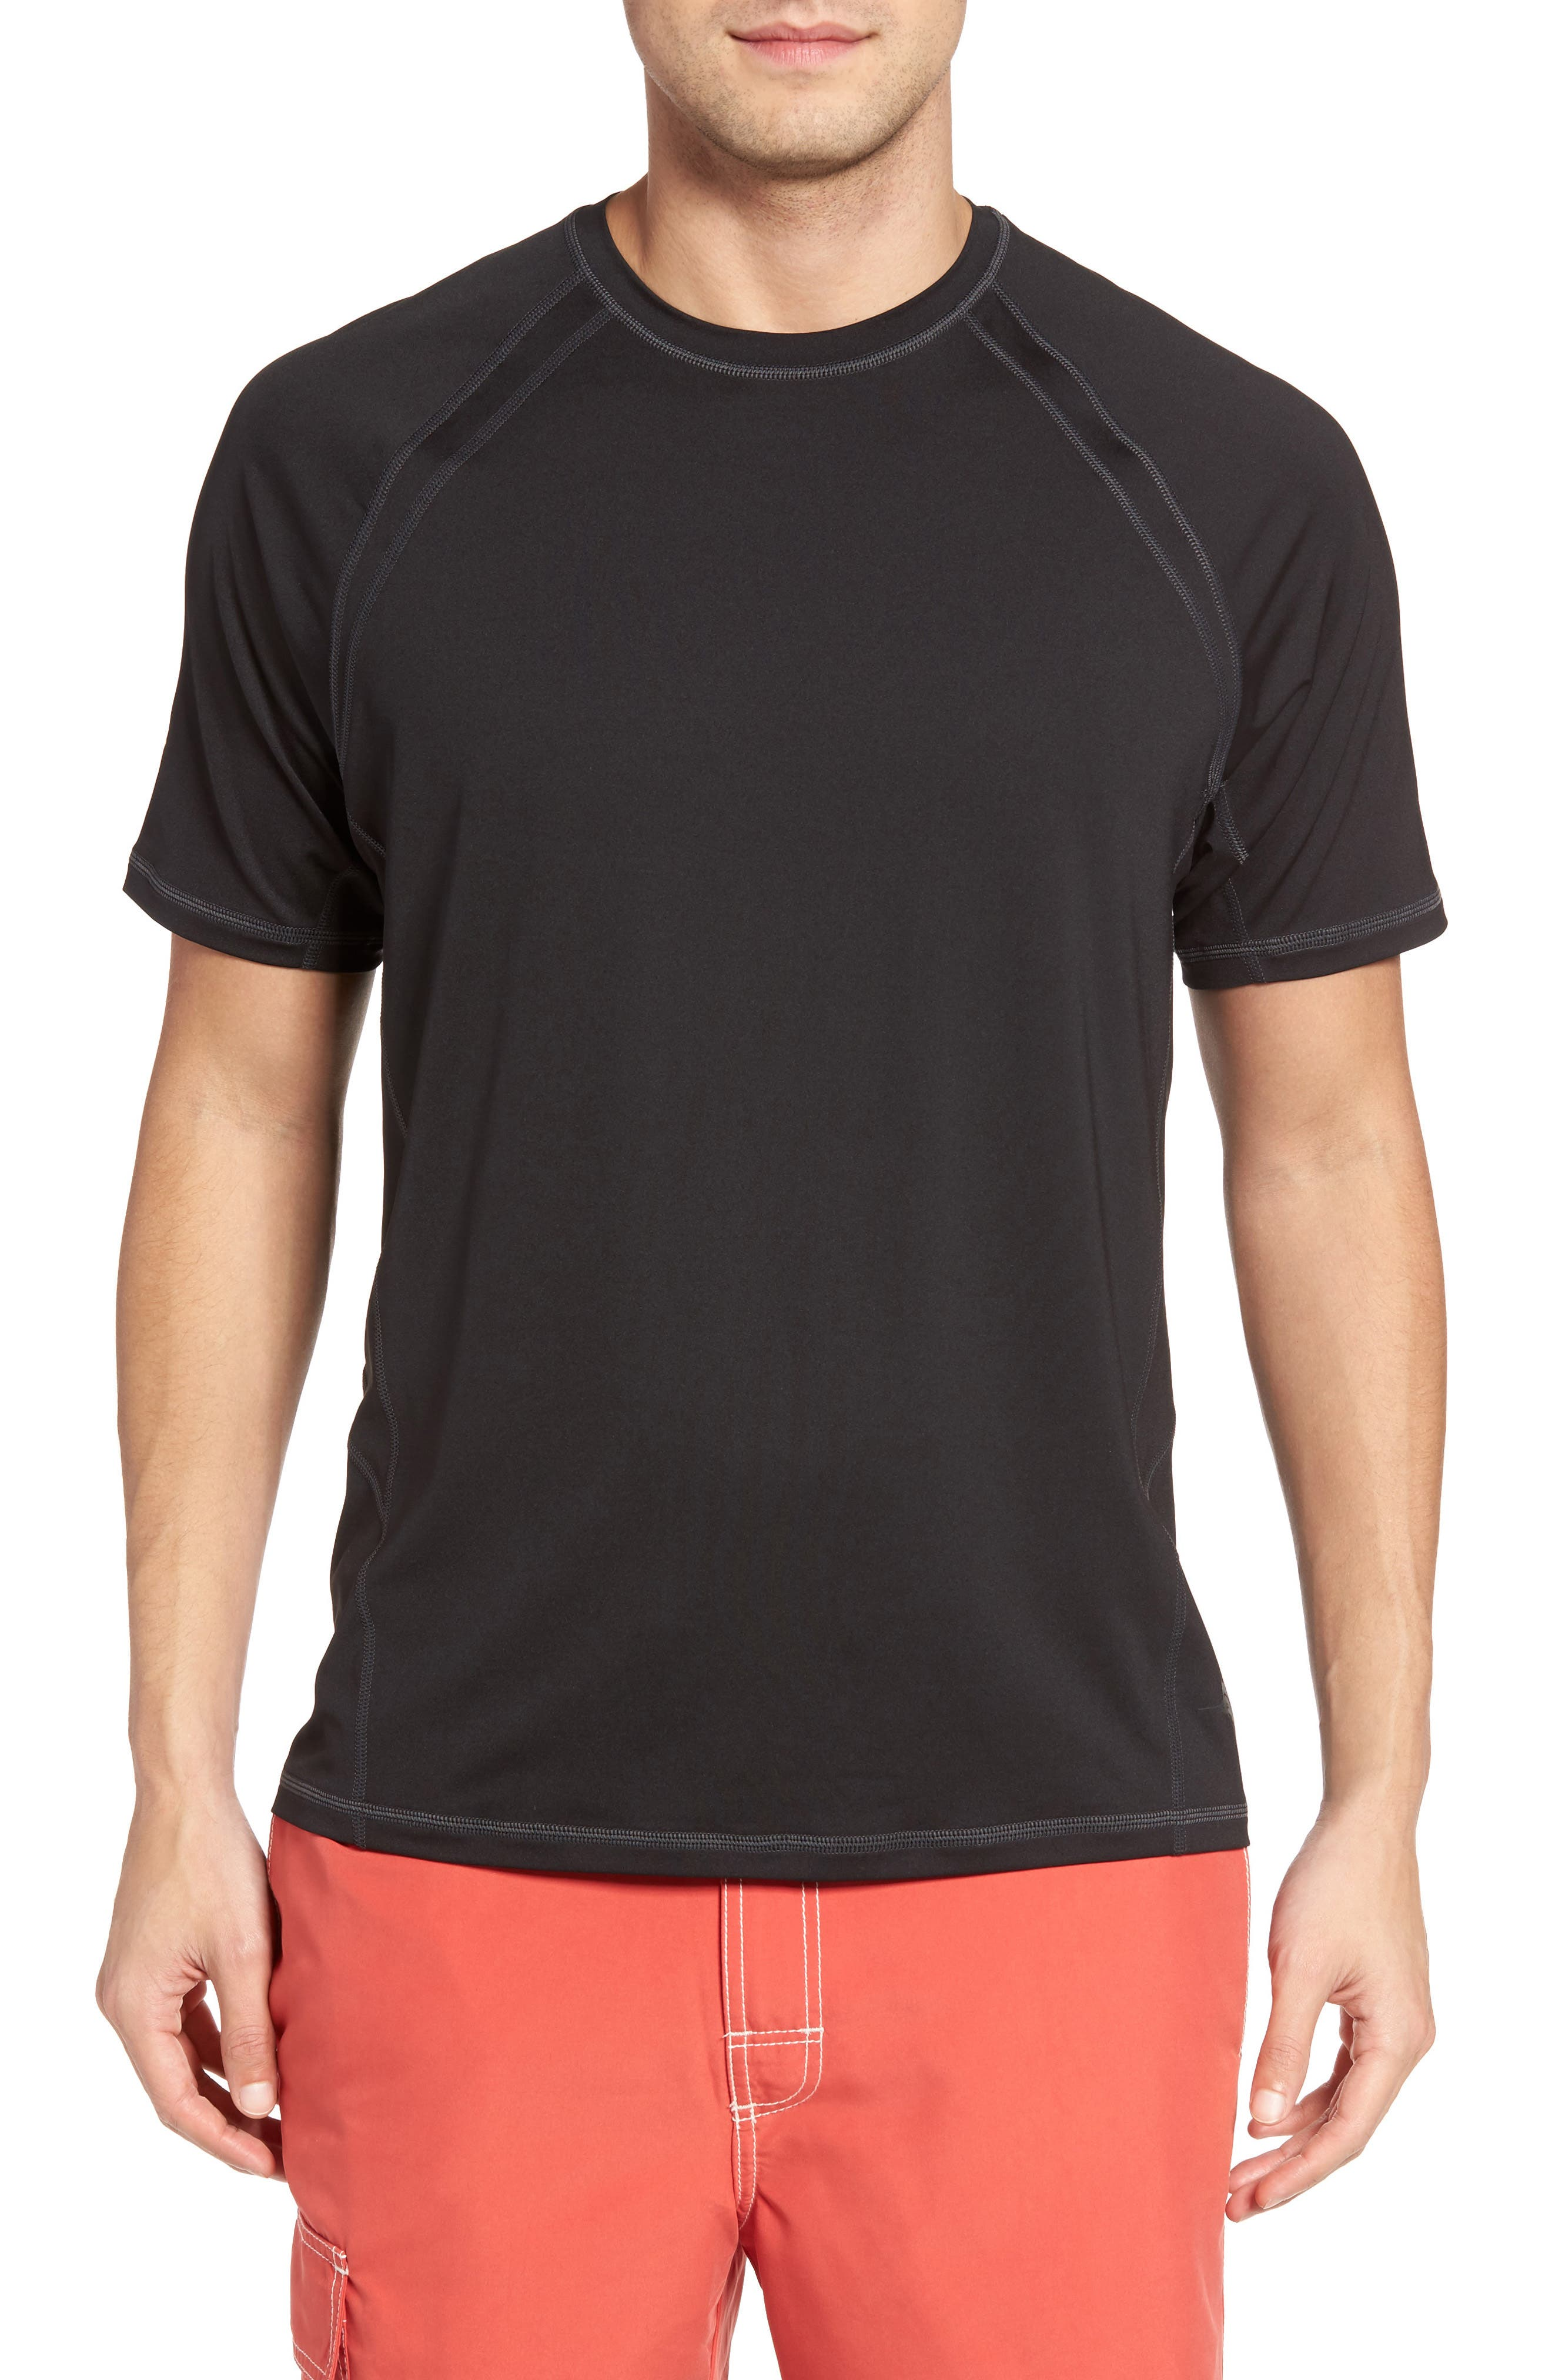 TOMMY BAHAMA Surf Chaser Crewneck T-Shirt, Main, color, 001